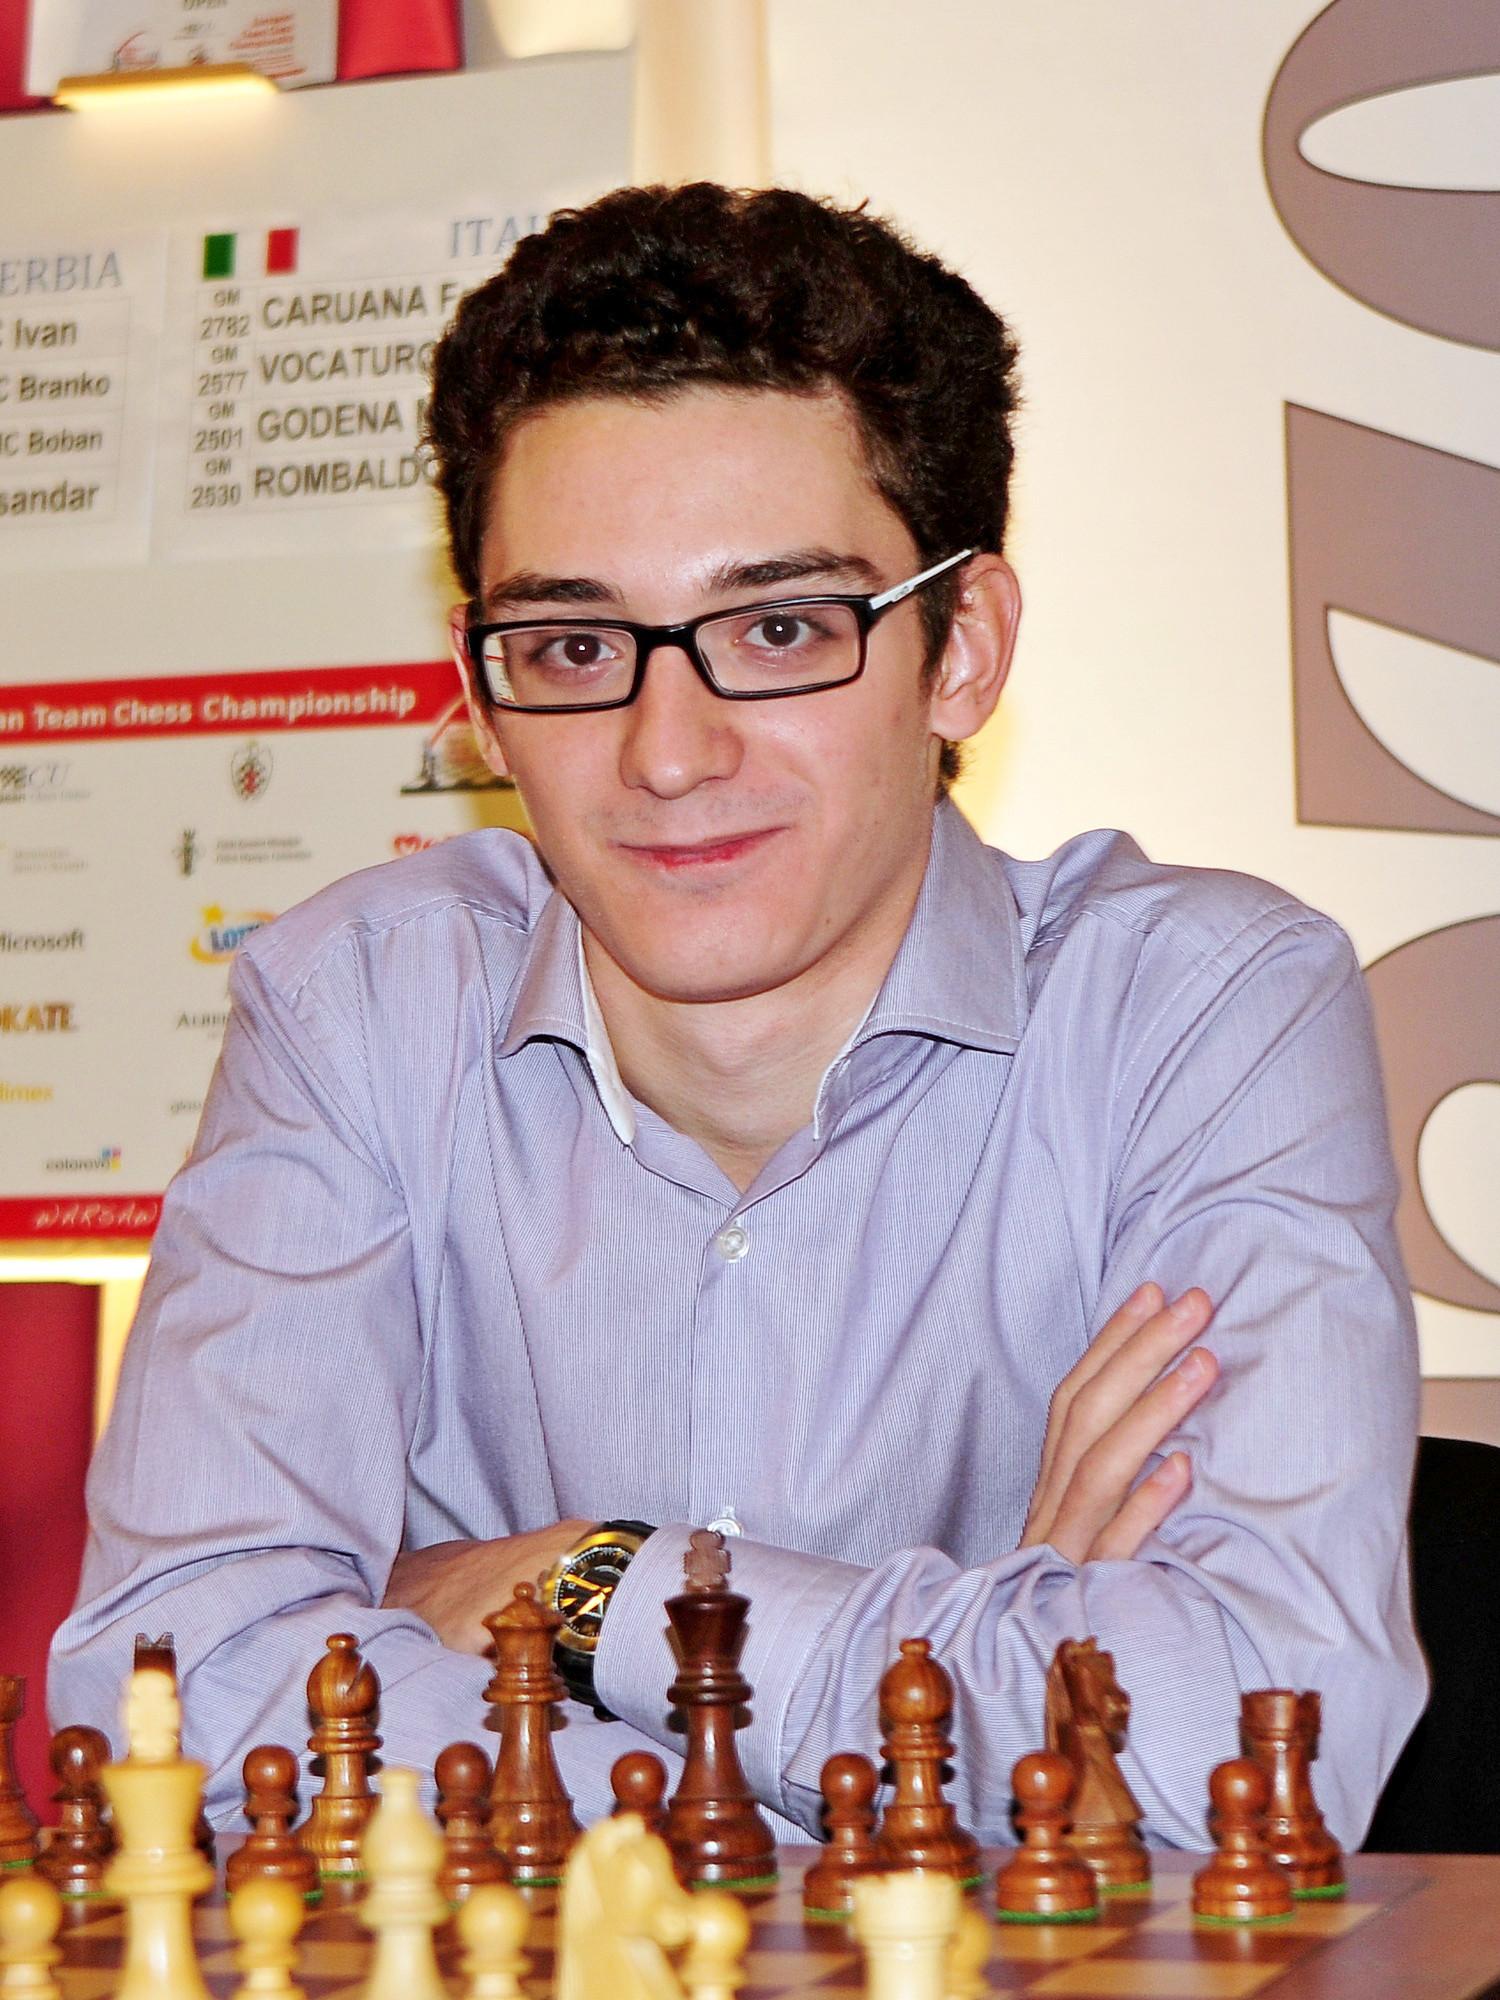 Top Famous Chess Player Fabiano Caruana